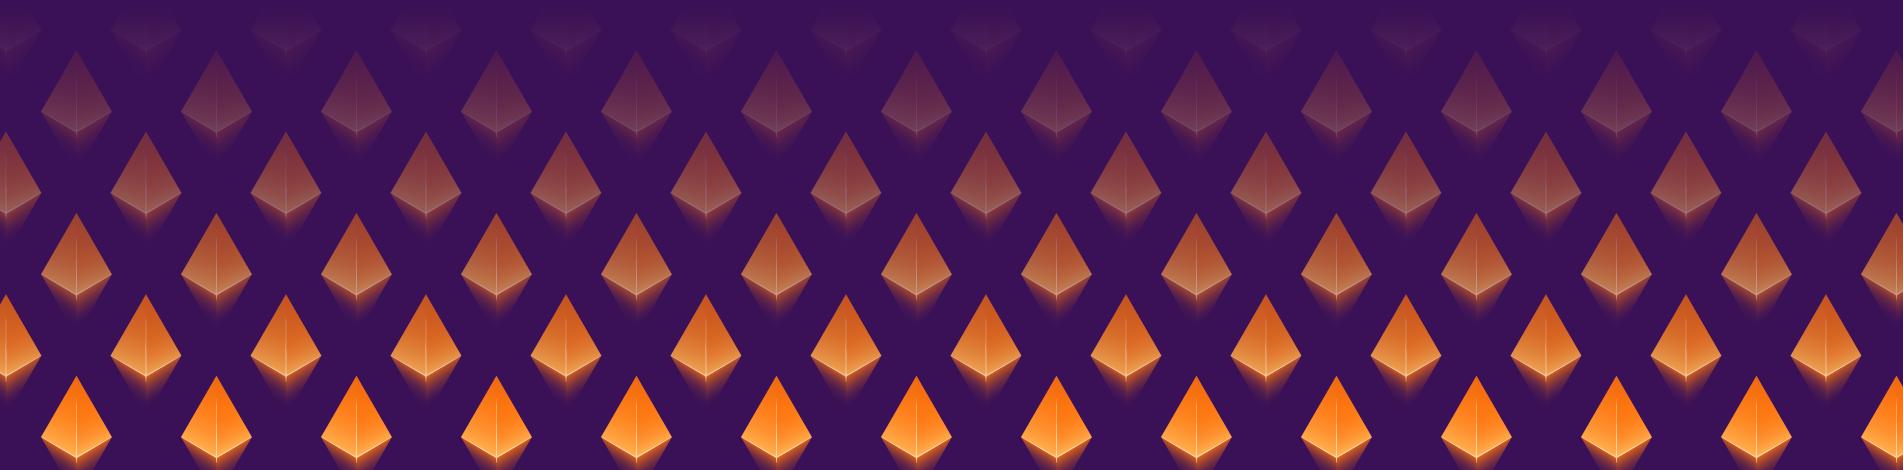 57 Top Ruby Gems We Use at RubyGarage